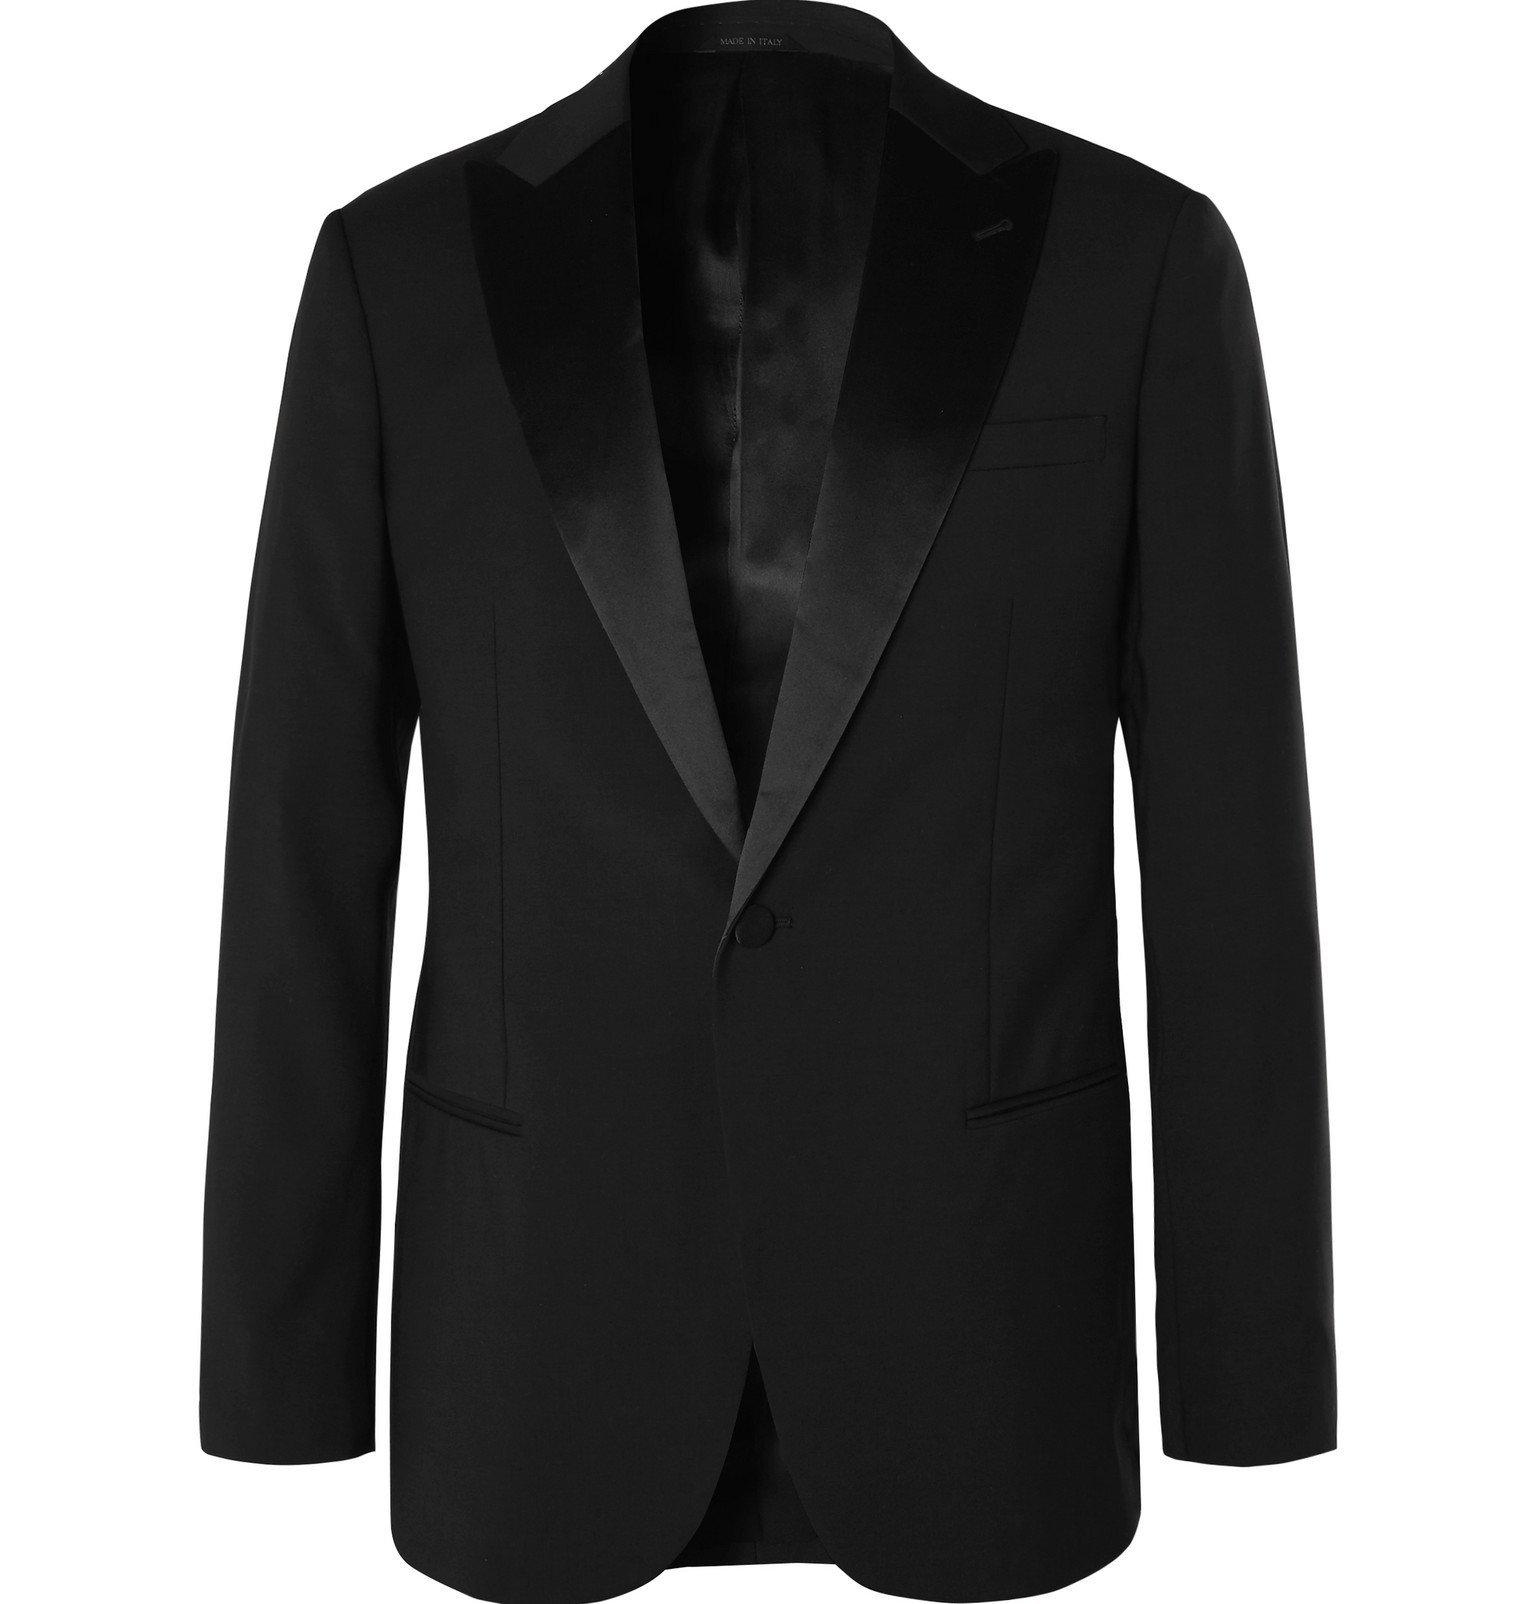 Giorgio Armani - Black Soho Slim-Fit Mulberry Silk Satin-Trimmed Virgin Wool Tuxedo Jacket - Black